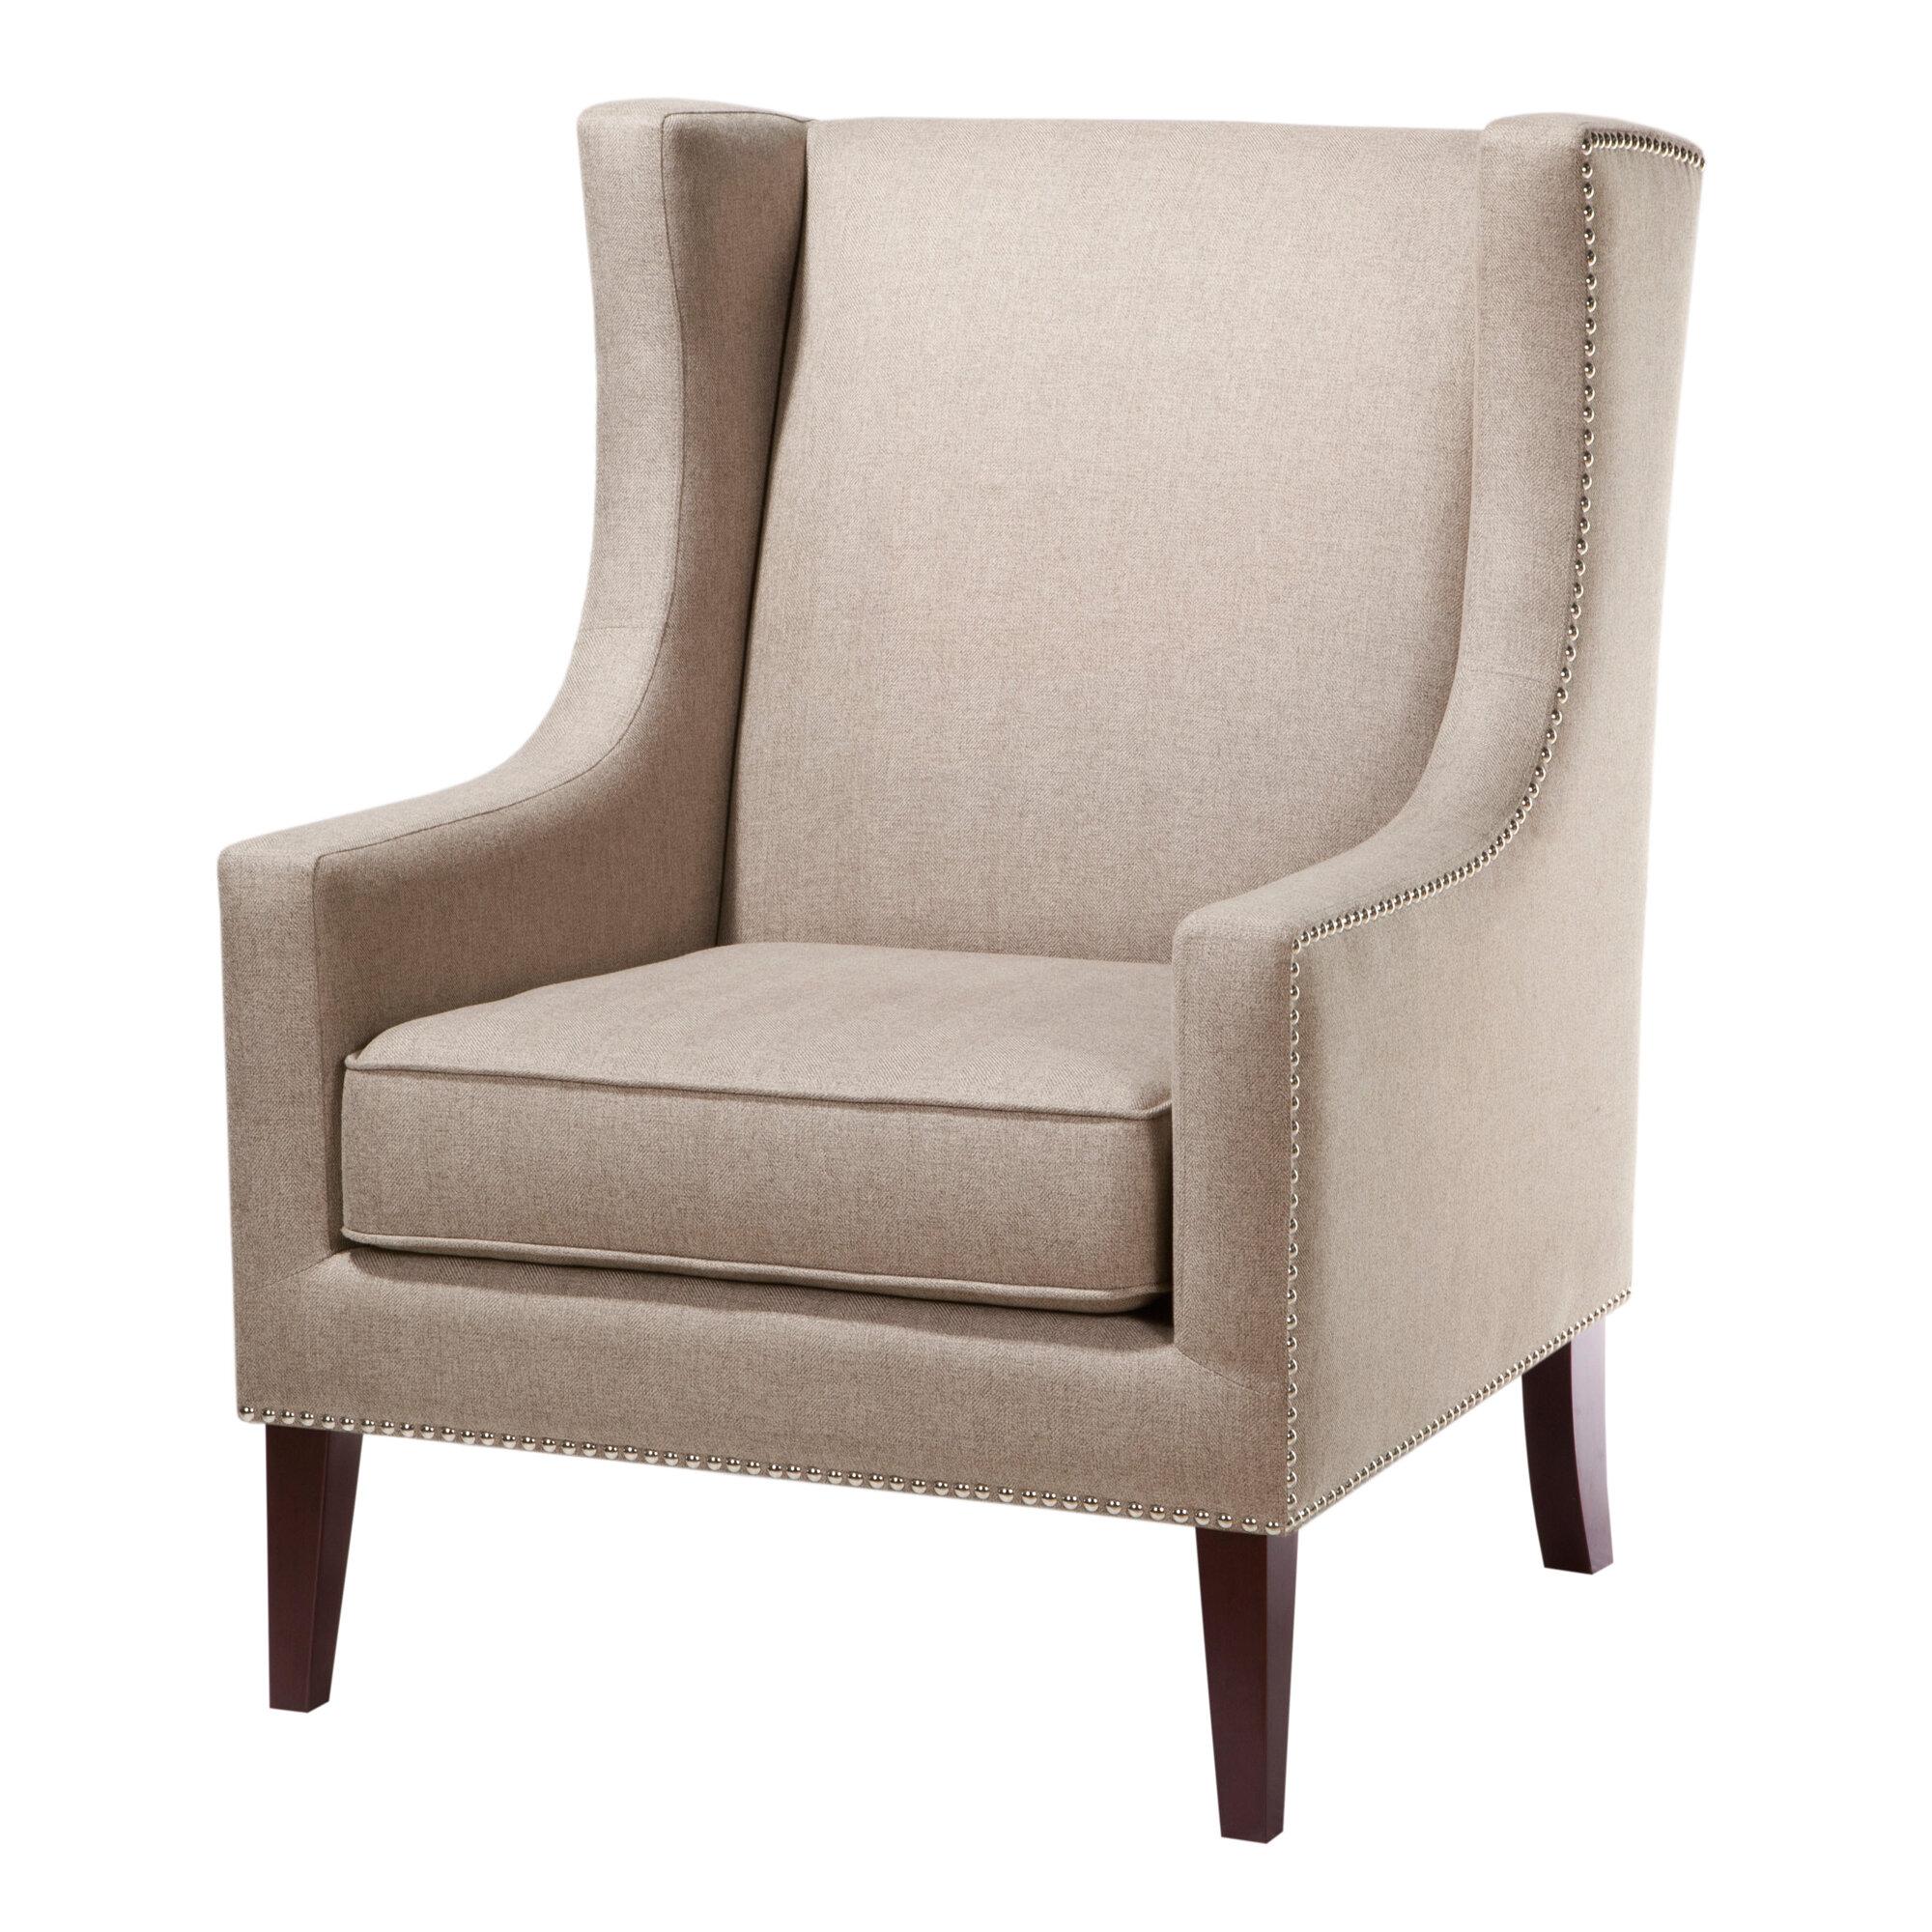 Chagnon Wingback Chair